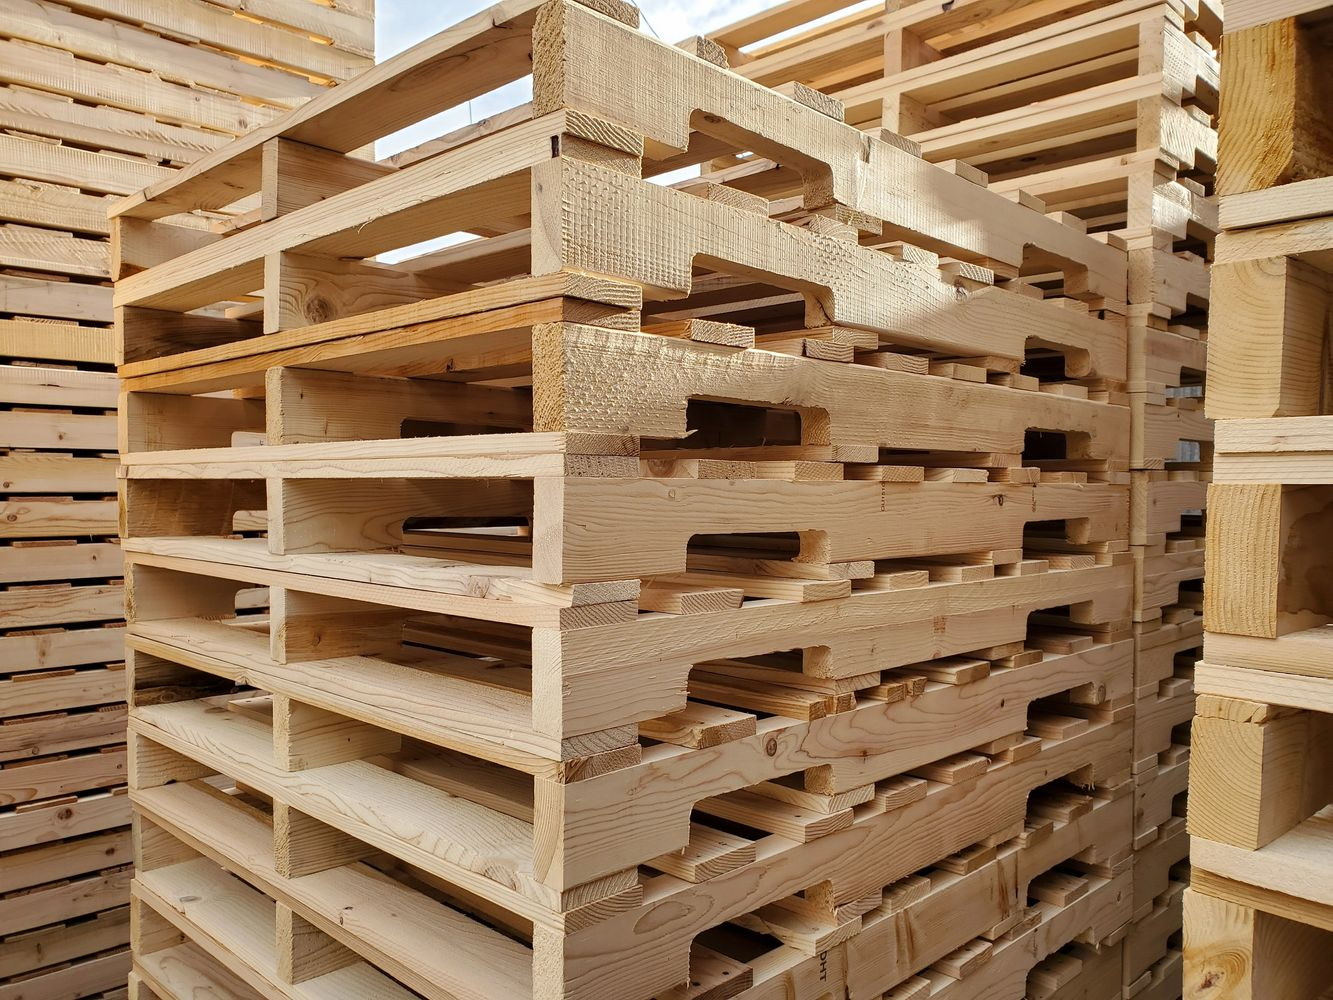 Stacked hardwood pallets